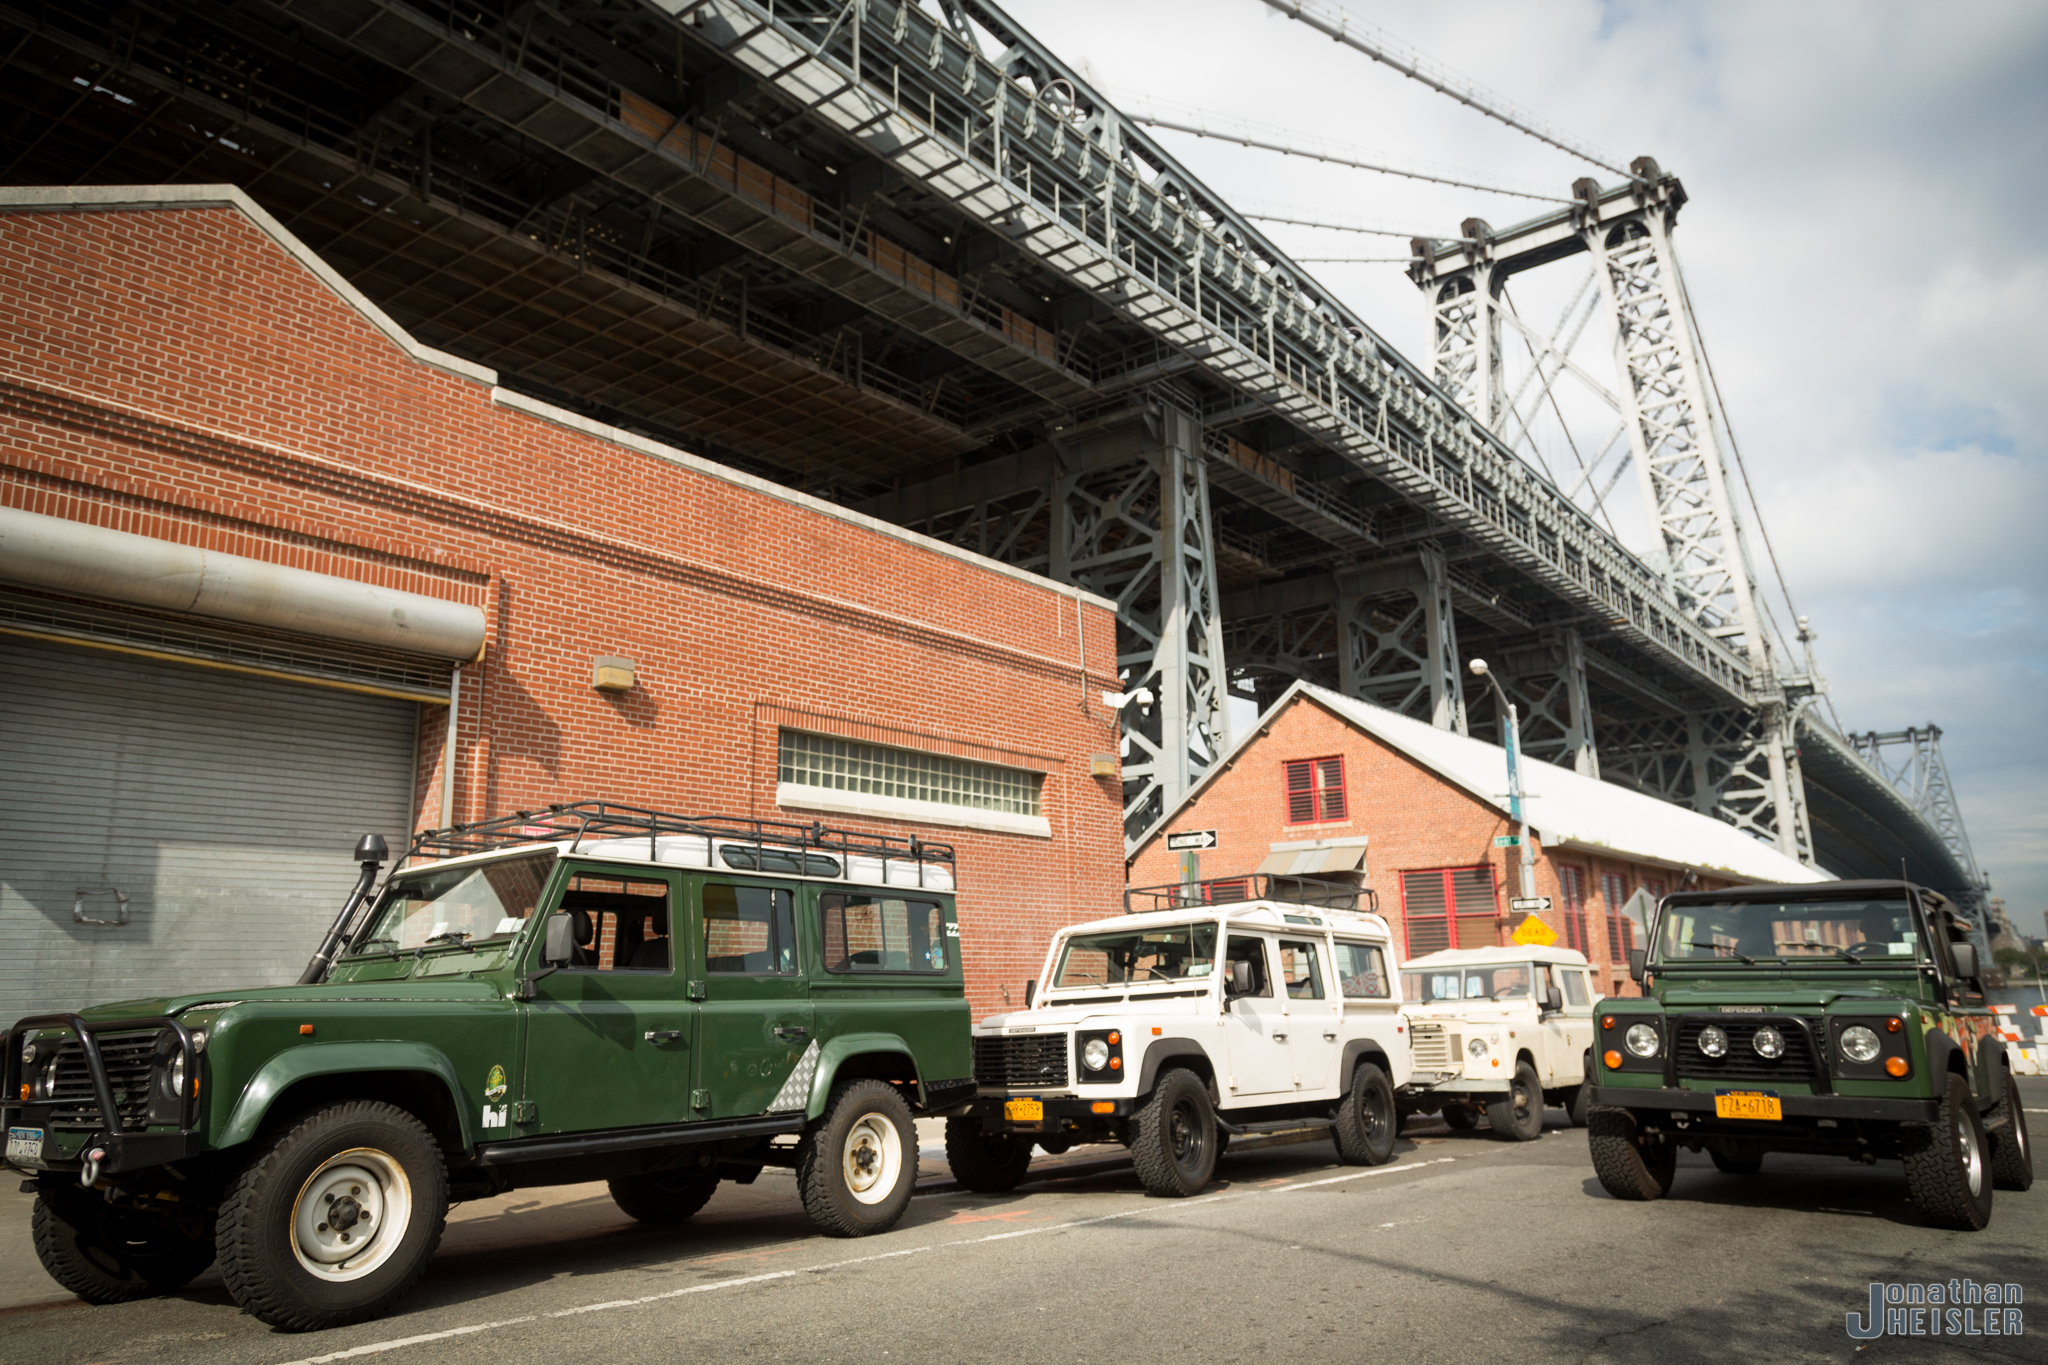 6-22-2014 _ Land Rover Defender  _  New York City00003.jpg